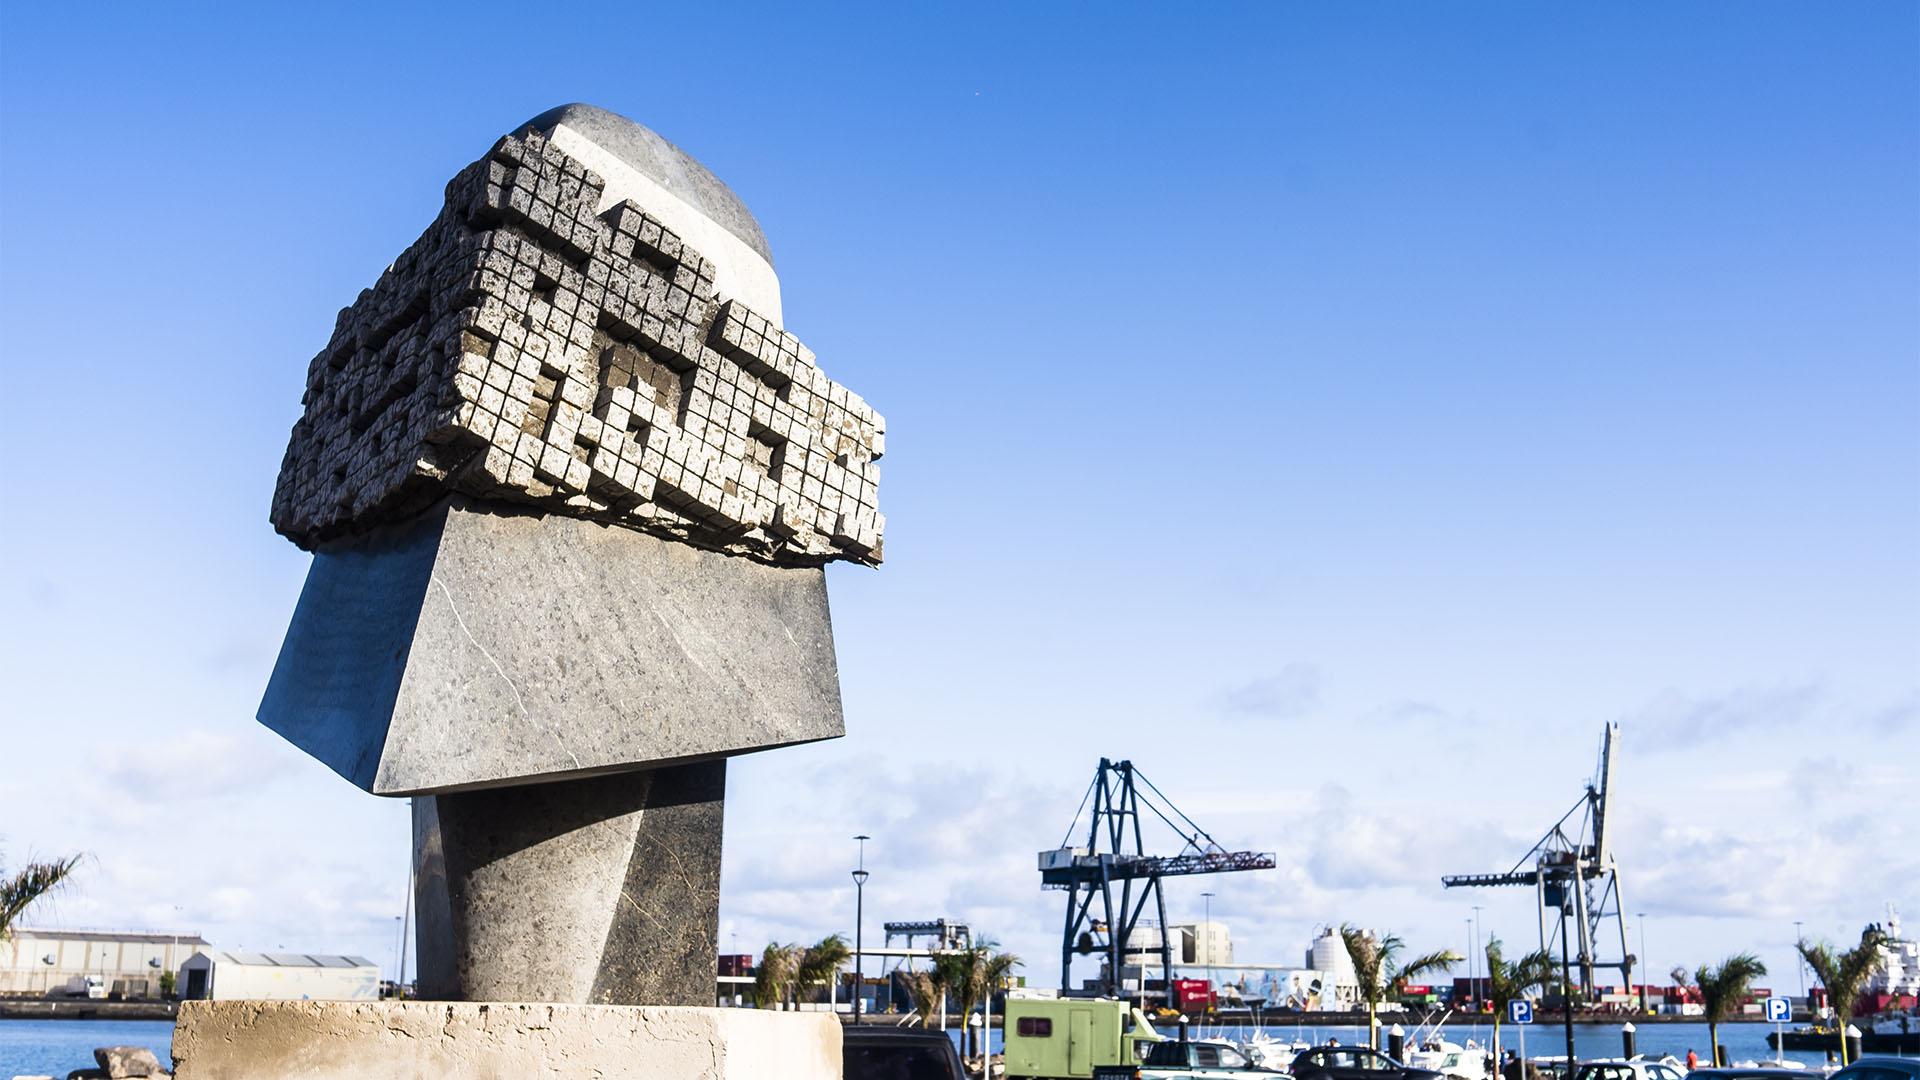 Skulpturen am Paseo von Puerto del Rosario Fuerteventura.